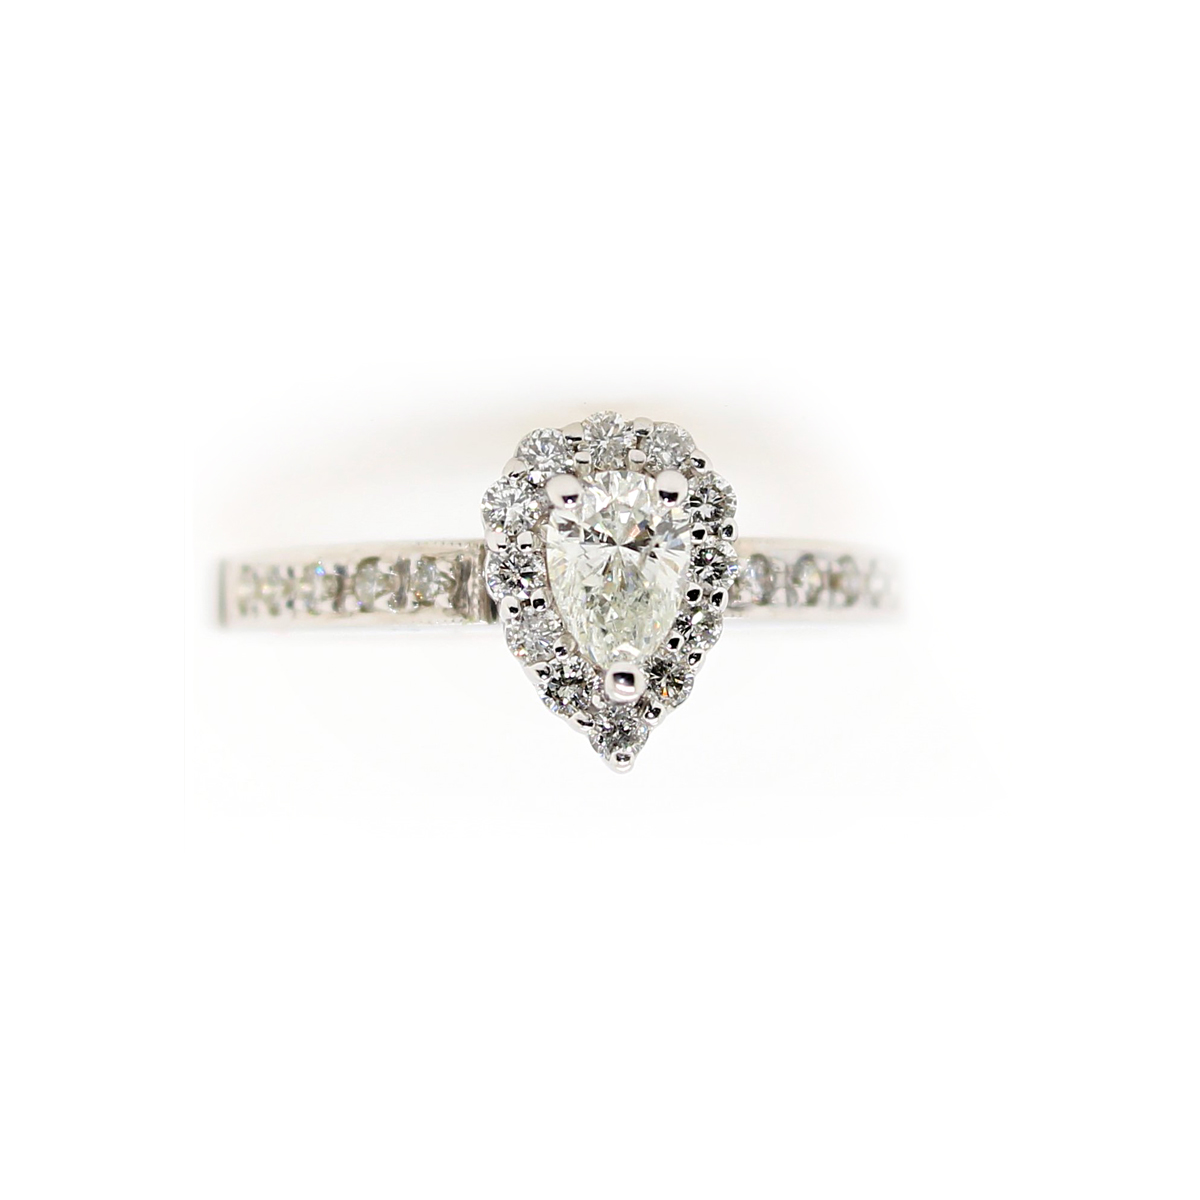 Vintage 14 Karat White Gold Pear Shaped Diamond Halo Ring